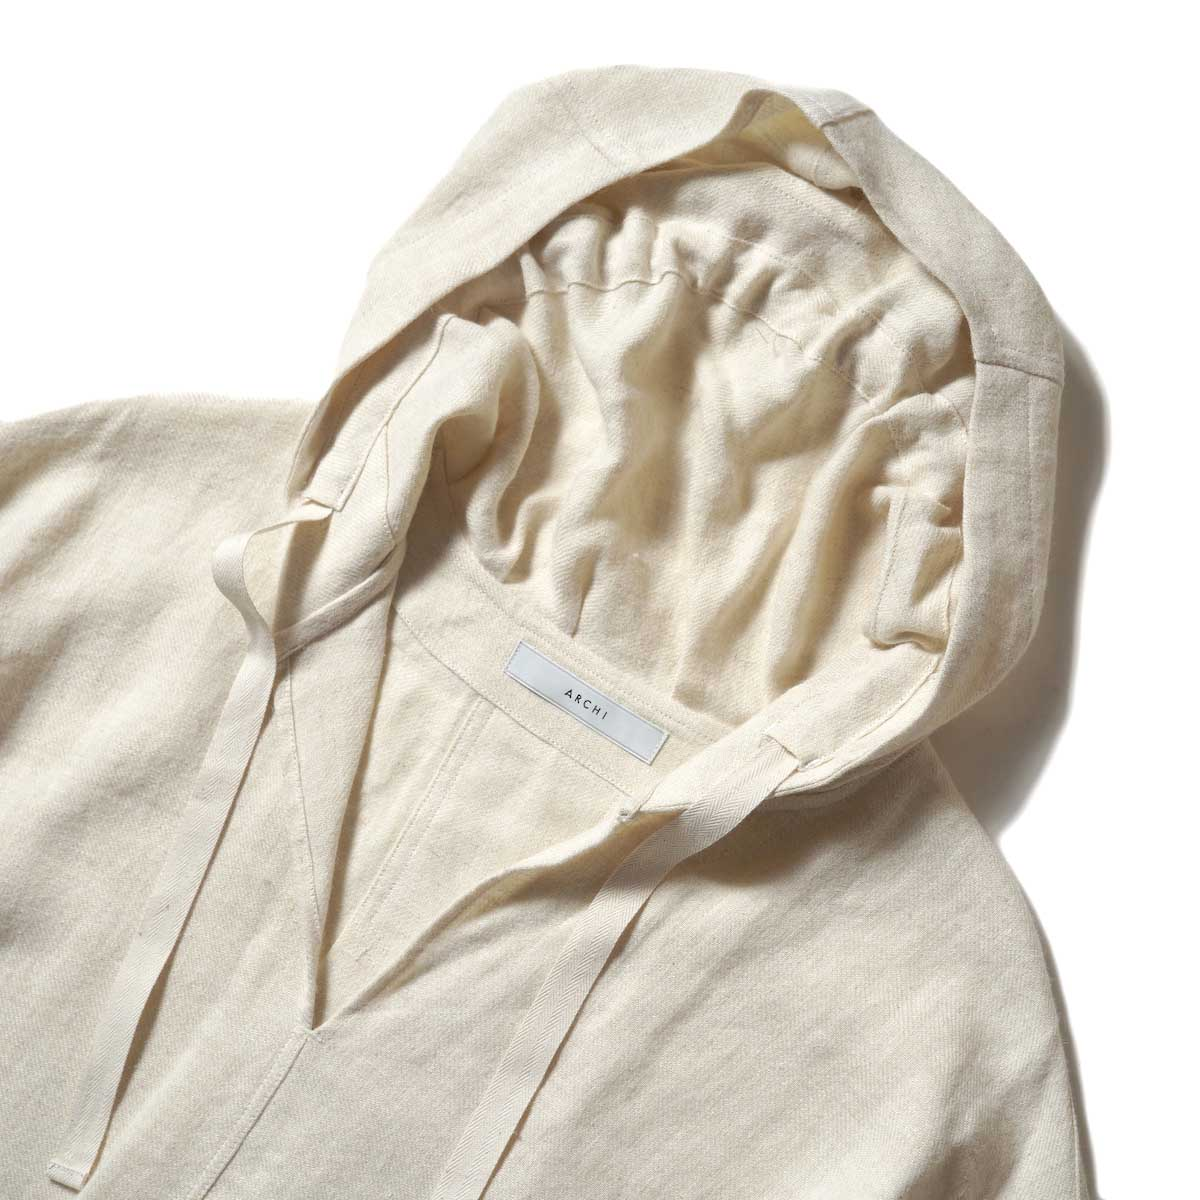 ARCHI / SOFT TWIST TWILL HOODIE OVER SHIRTS (White) フロント